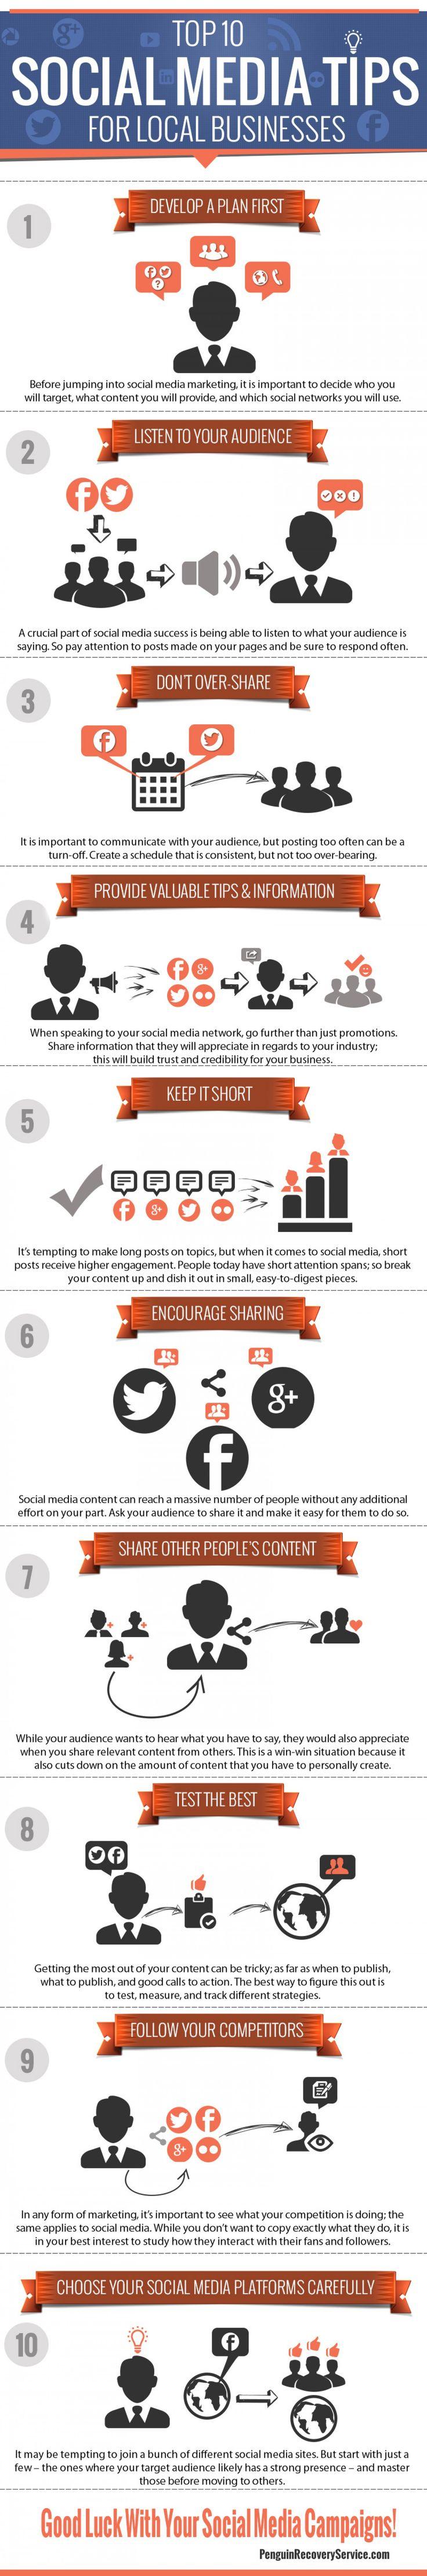 Top 10 Social Media Tips For Local Business #contentmarketing | Repinned by @lelandsandler